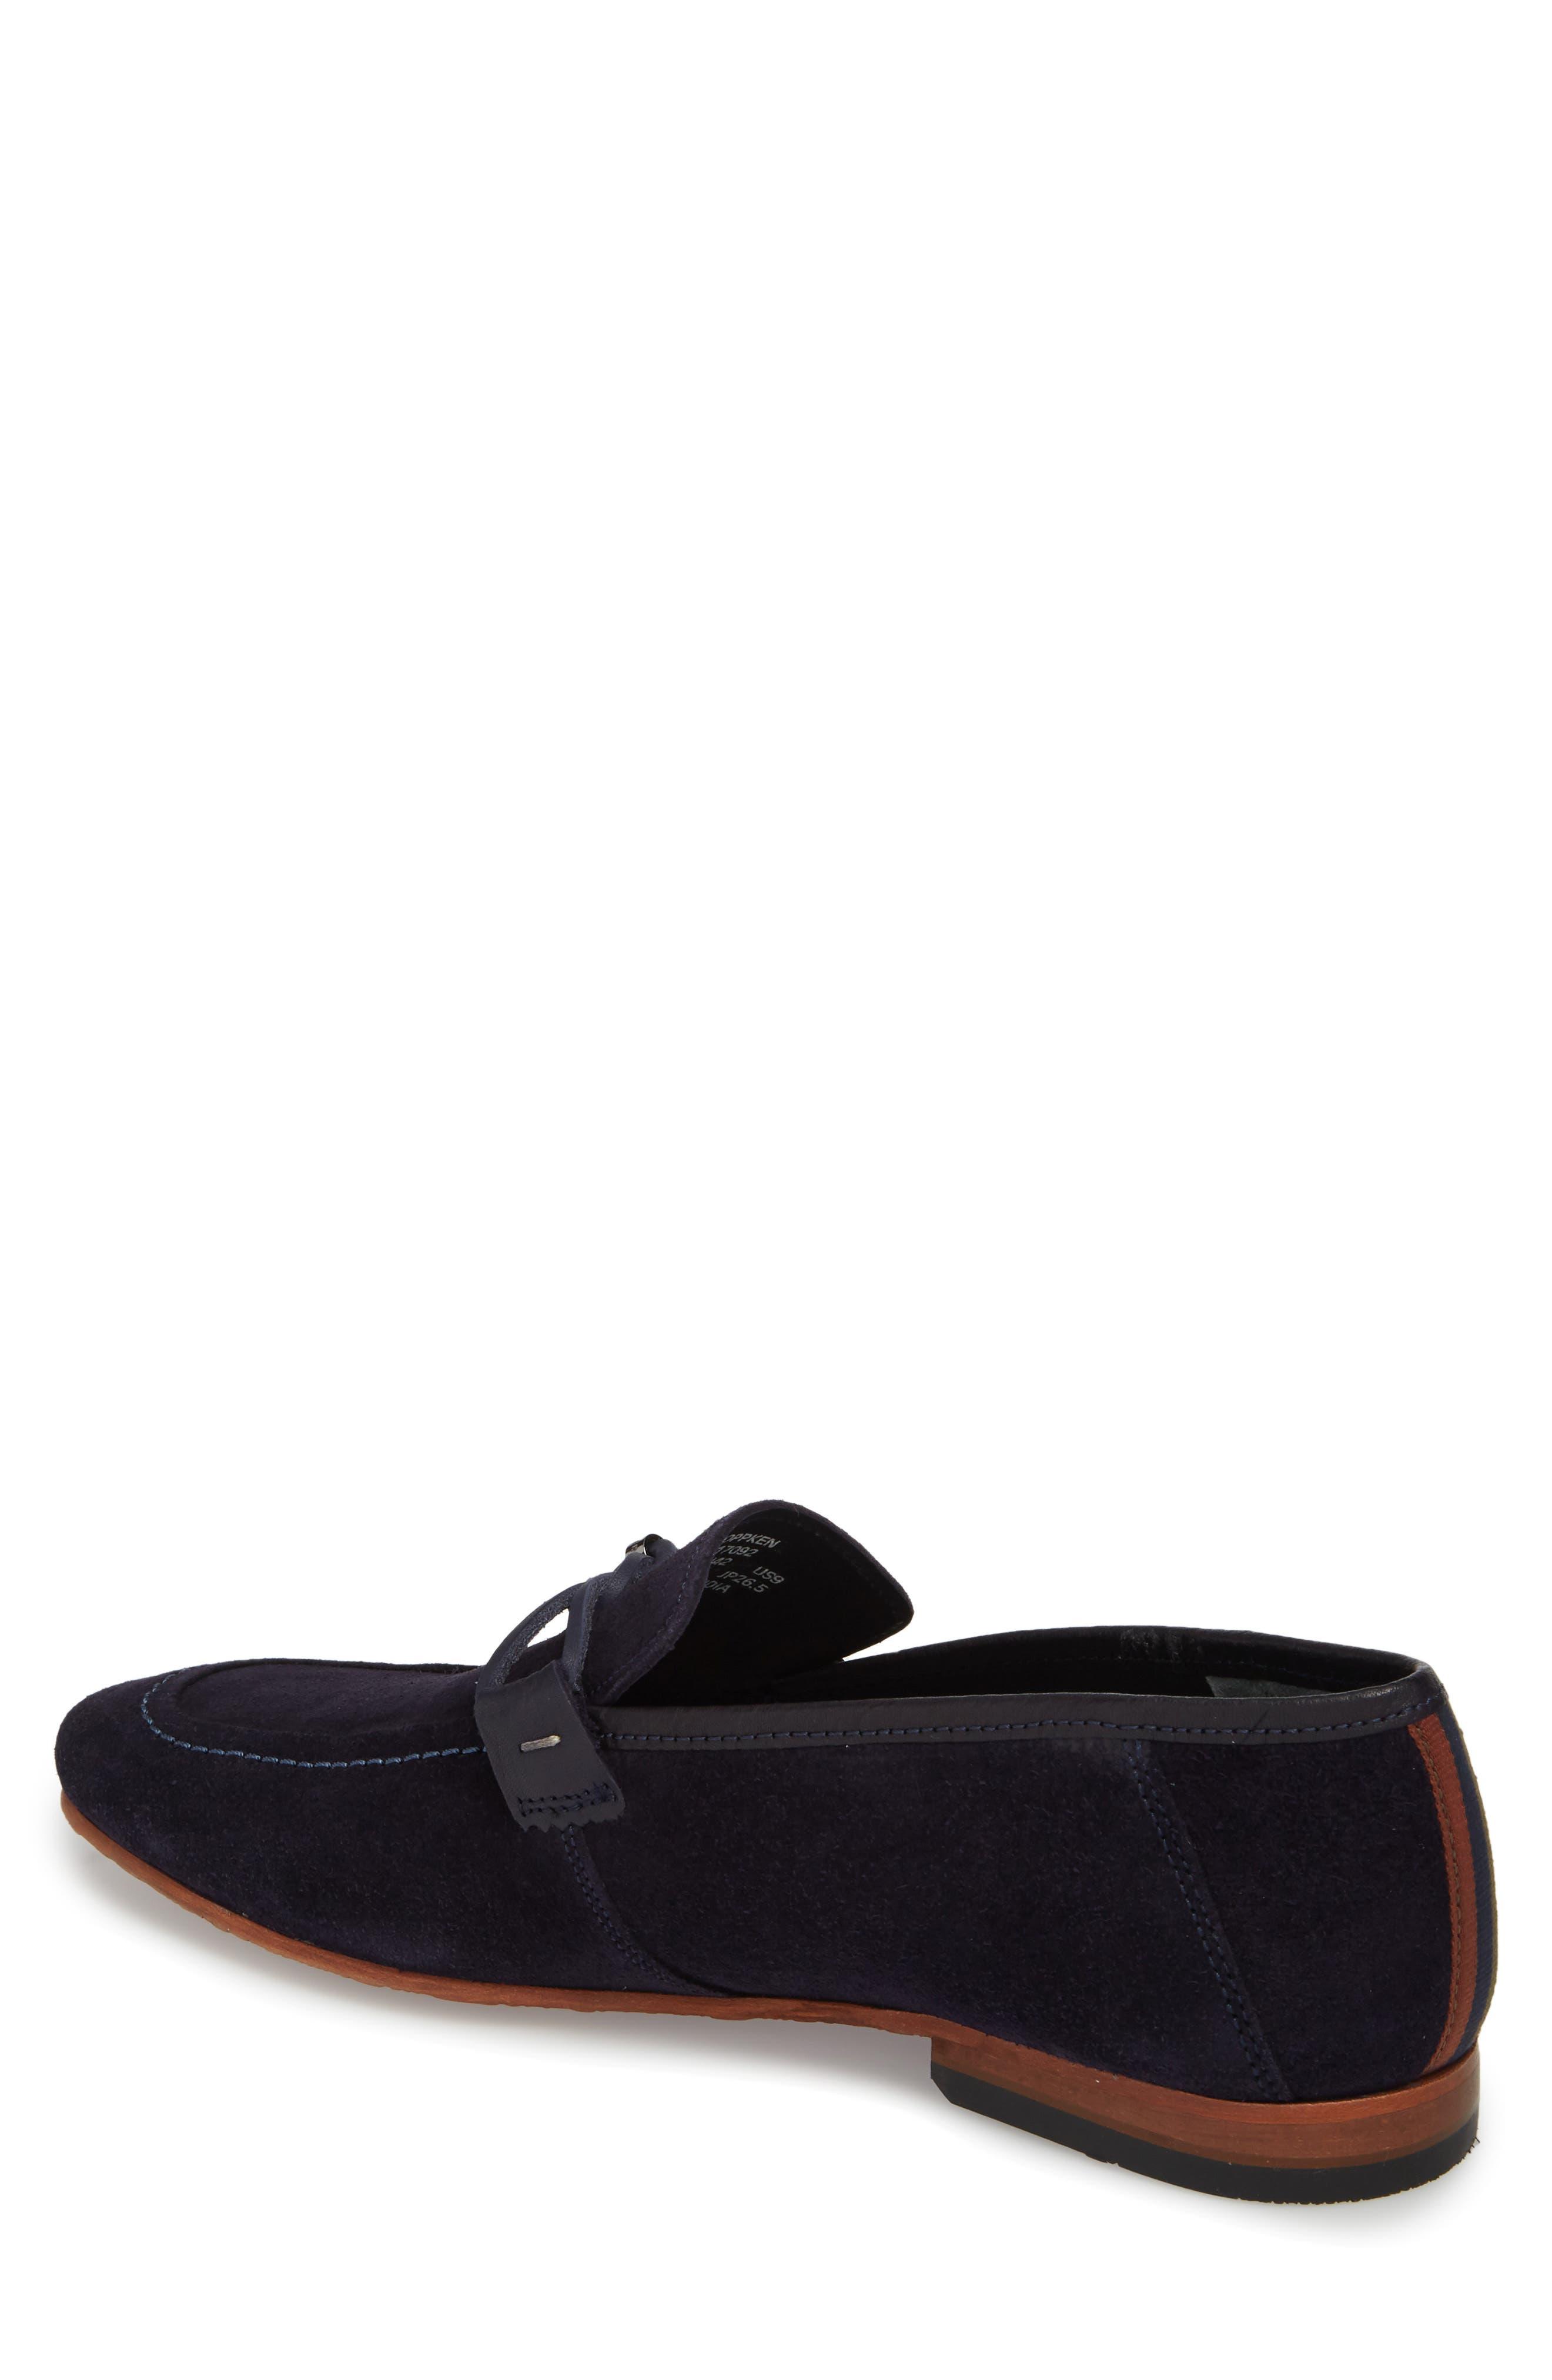 Hoppken Convertible Knotted Loafer,                             Alternate thumbnail 2, color,                             Dark Blue Suede